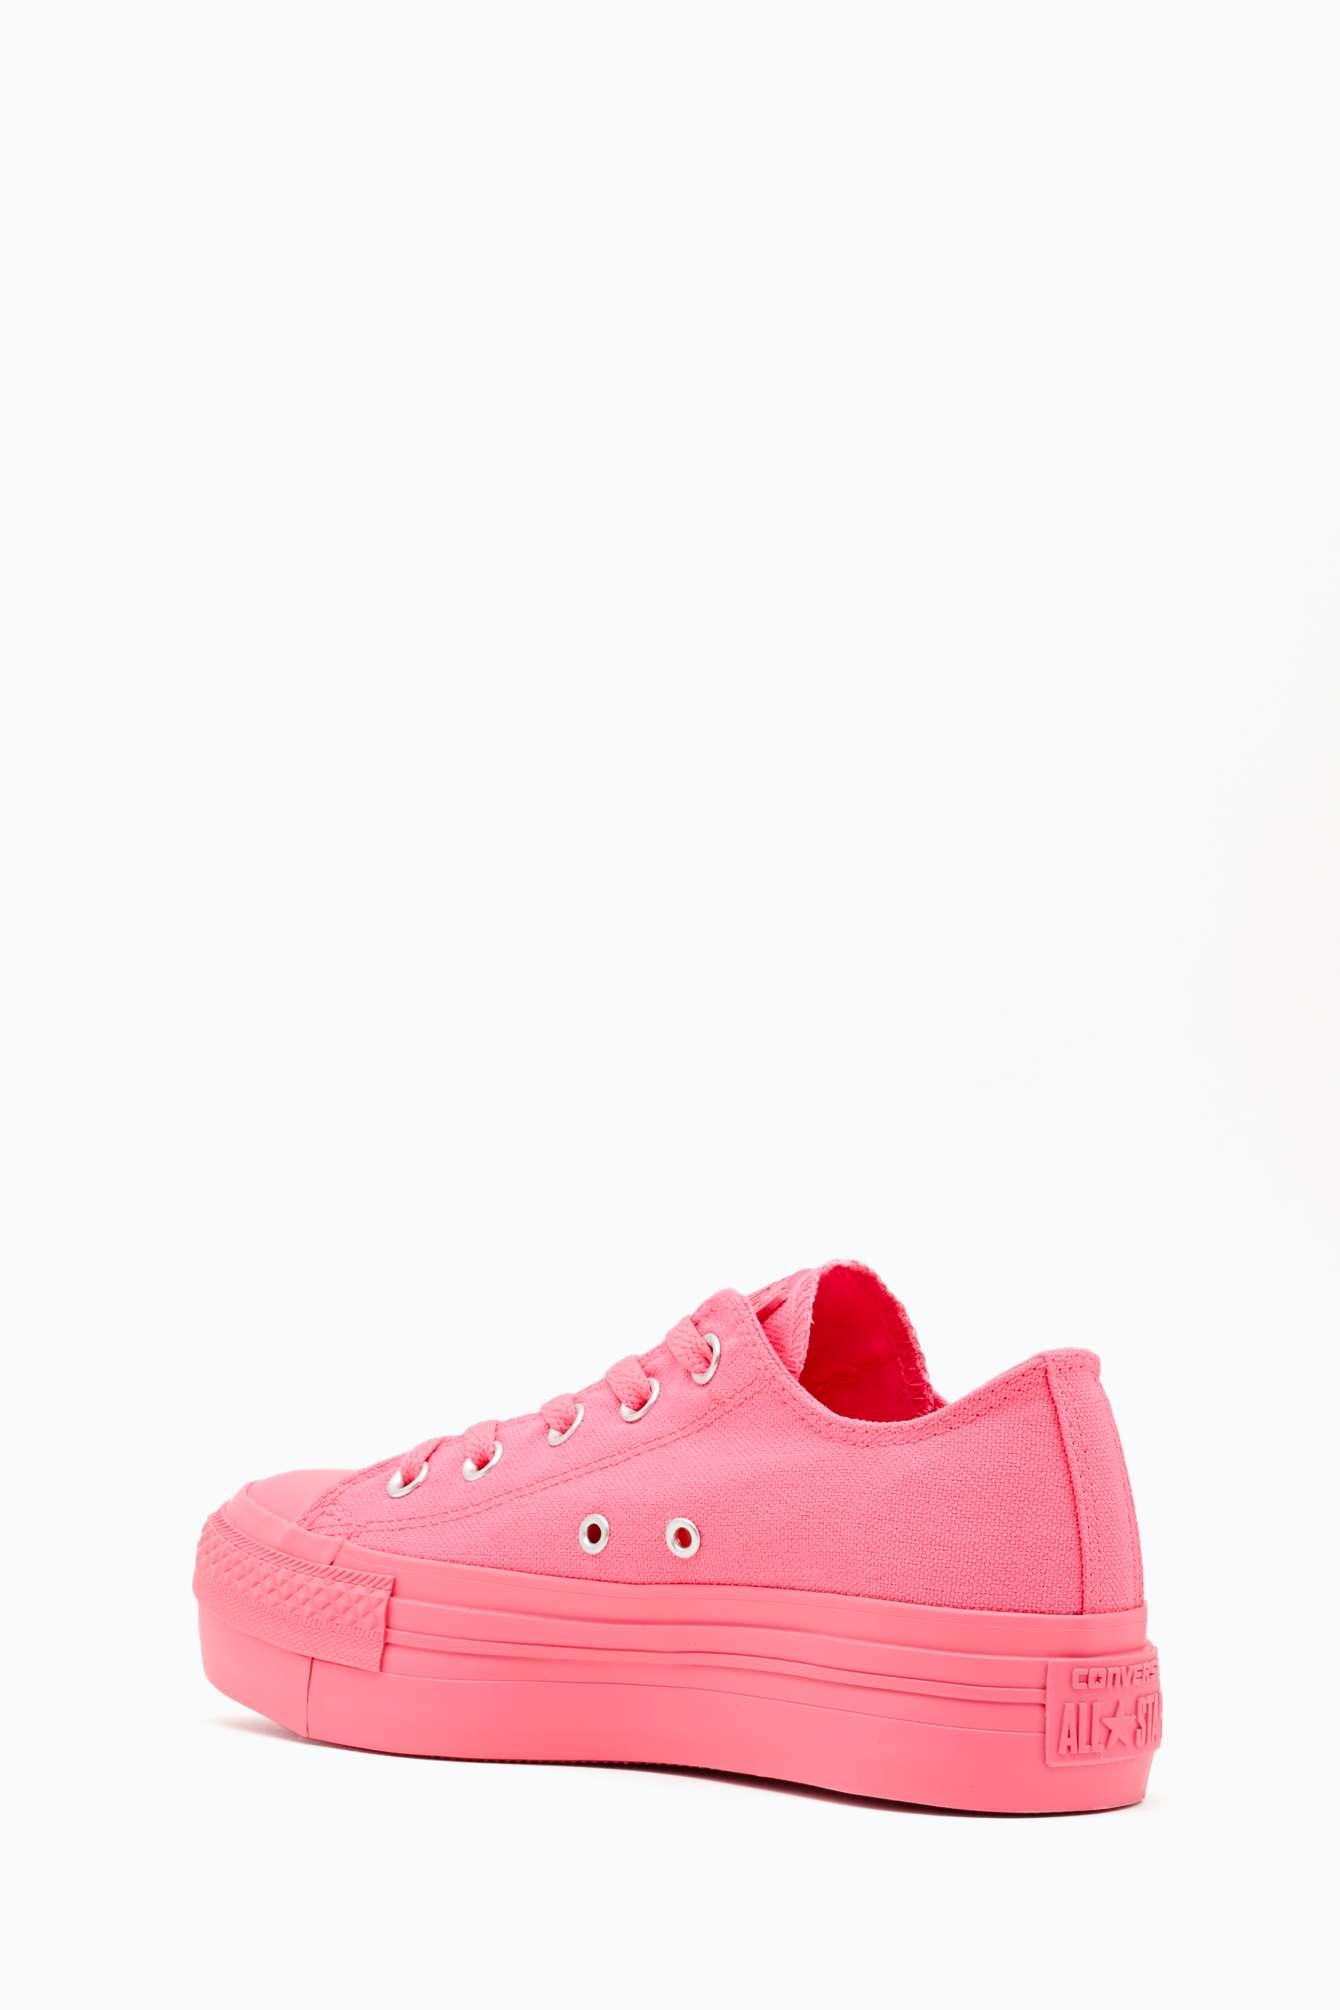 d6651e33eef0ba Lyst - Nasty Gal All Star Platform Sneaker Pink in Pink